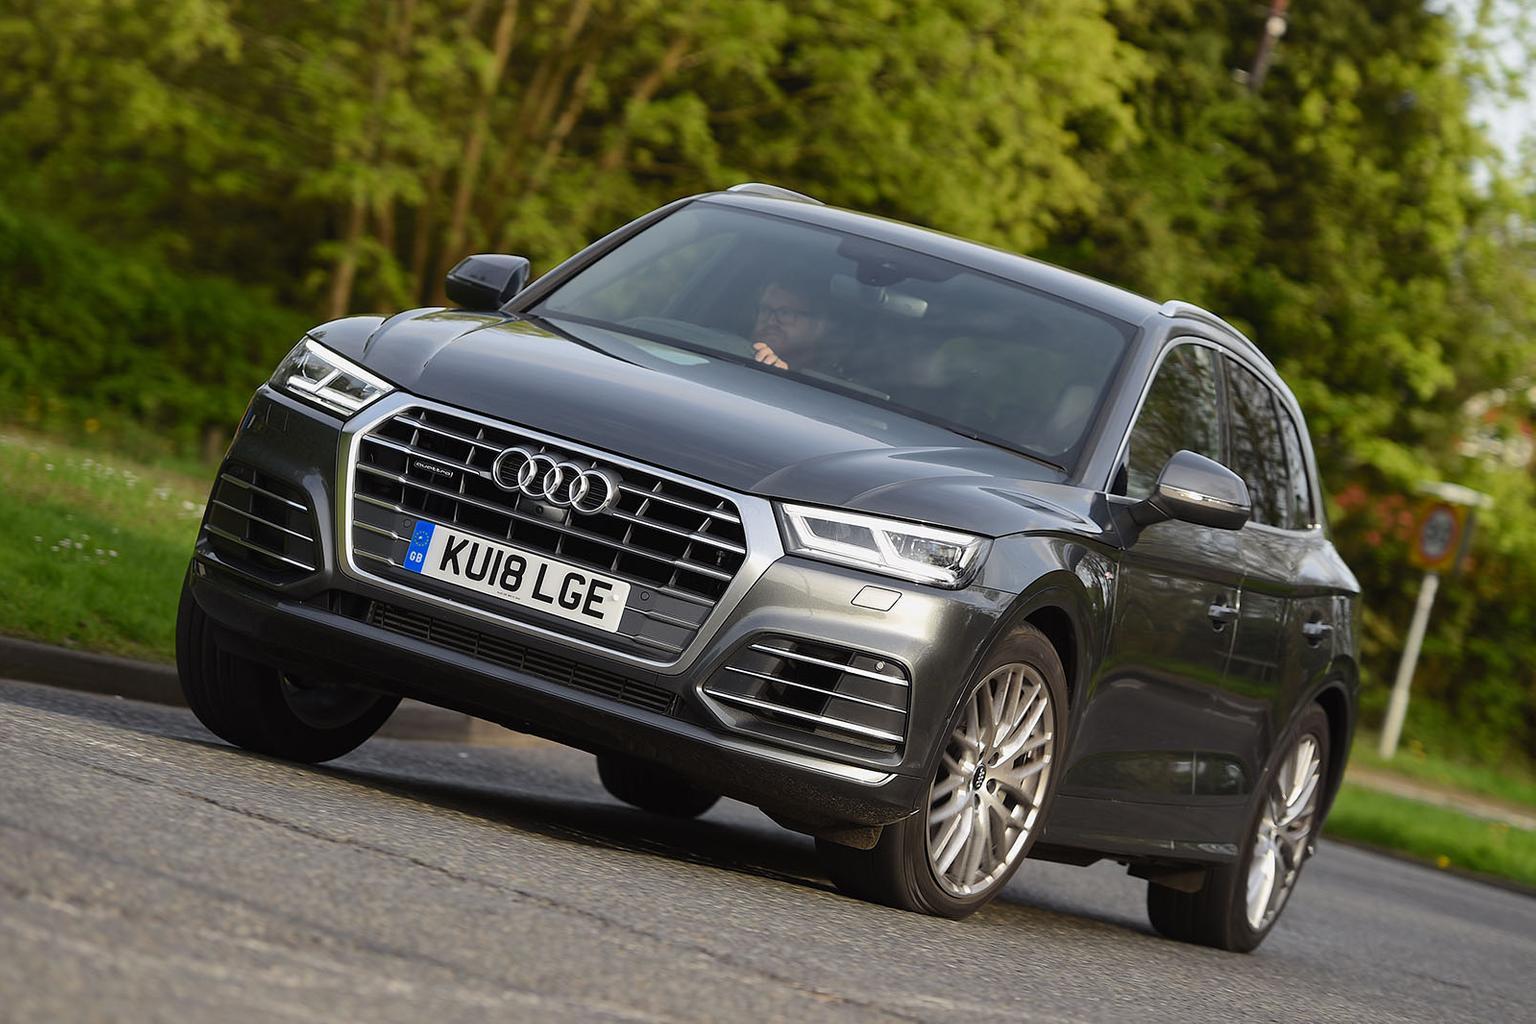 New Audi Q5 diesel vs Volvo XC60 hybrid